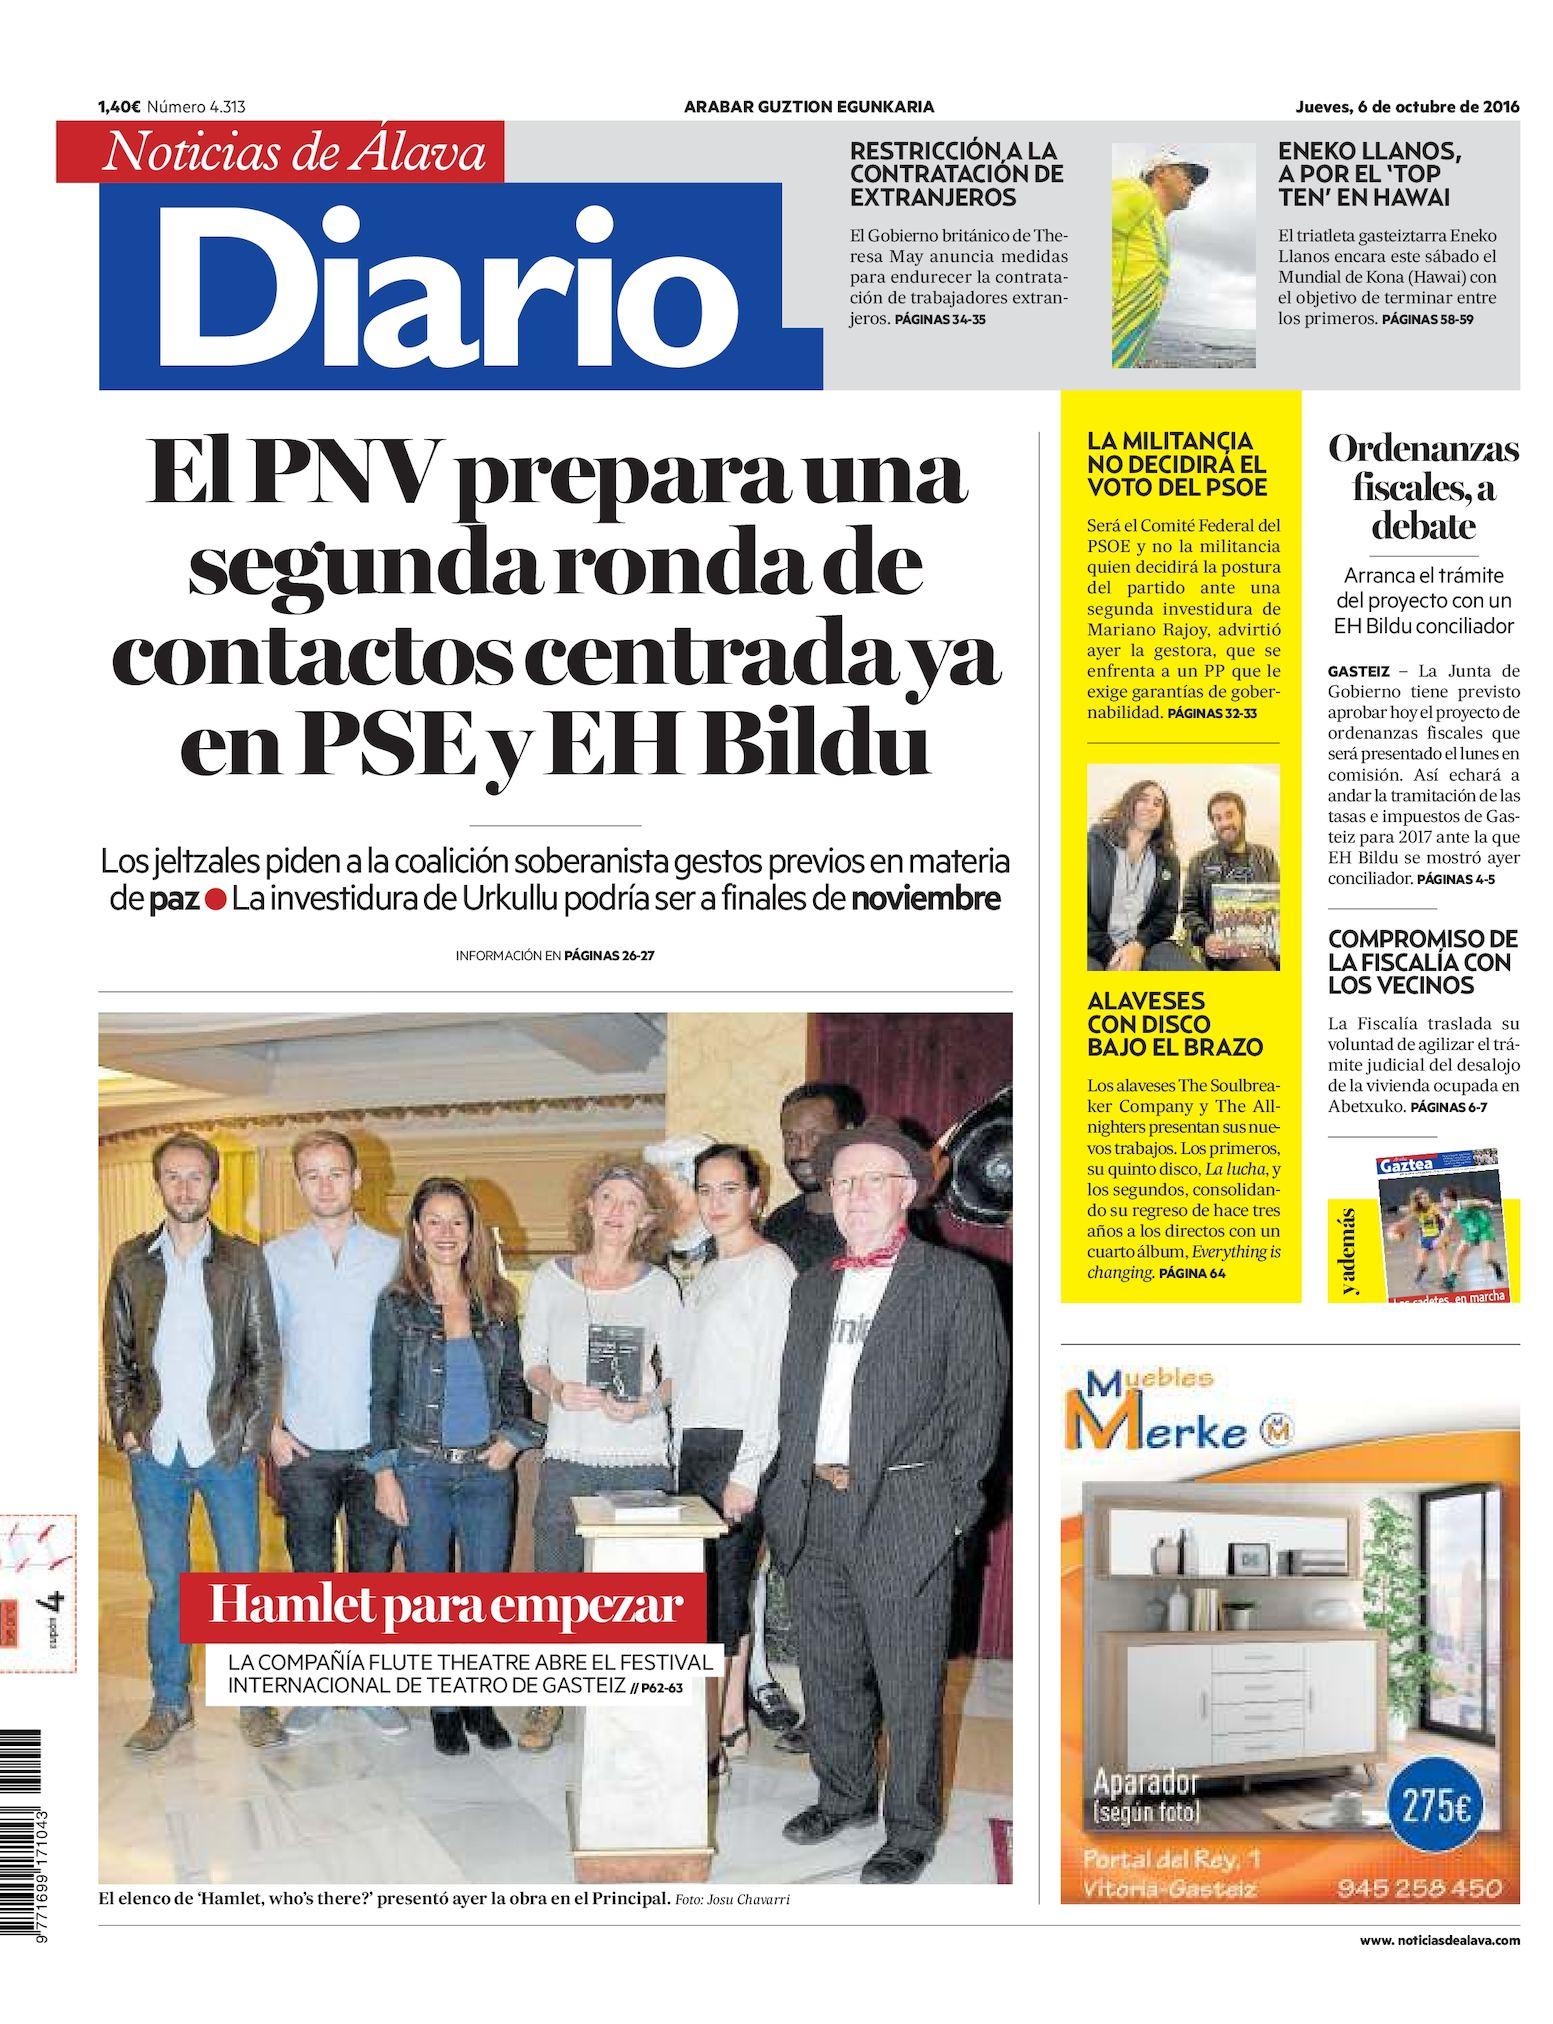 Calaméo - Diario de Noticias de Álava 20161006 1381ebbadf93